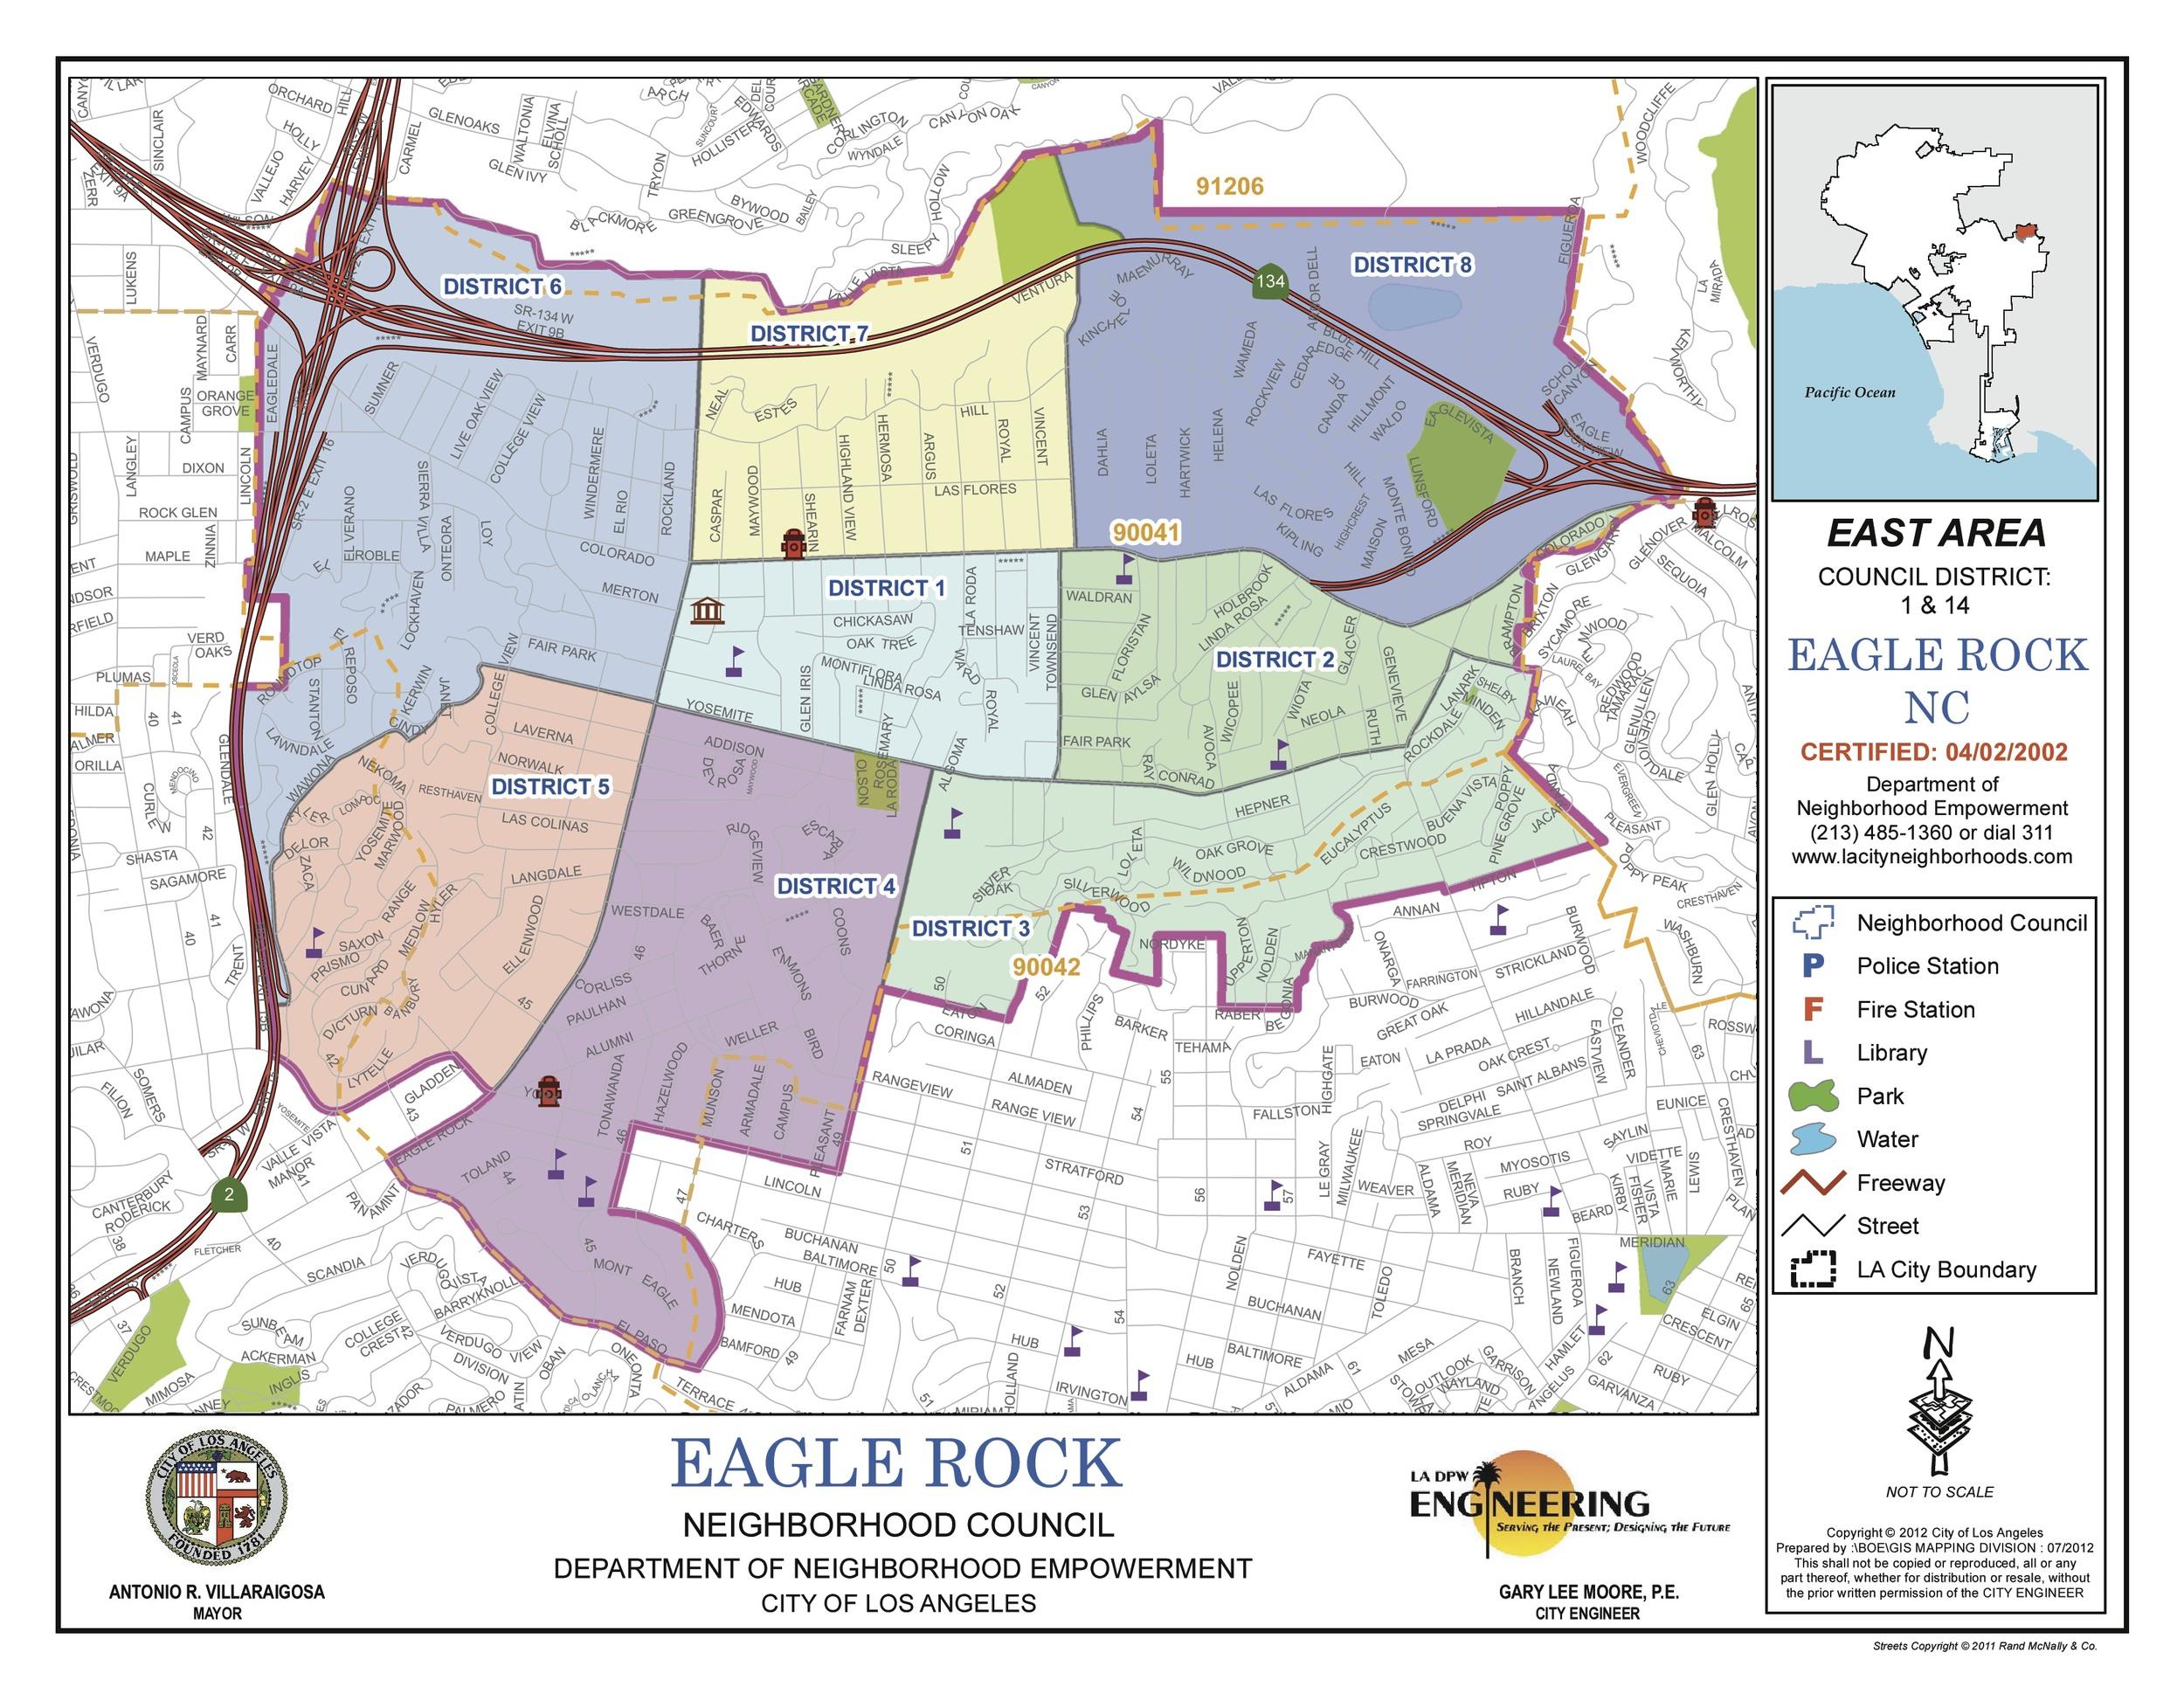 Eagle-Rock-Neighborhood-Council-map.jpg